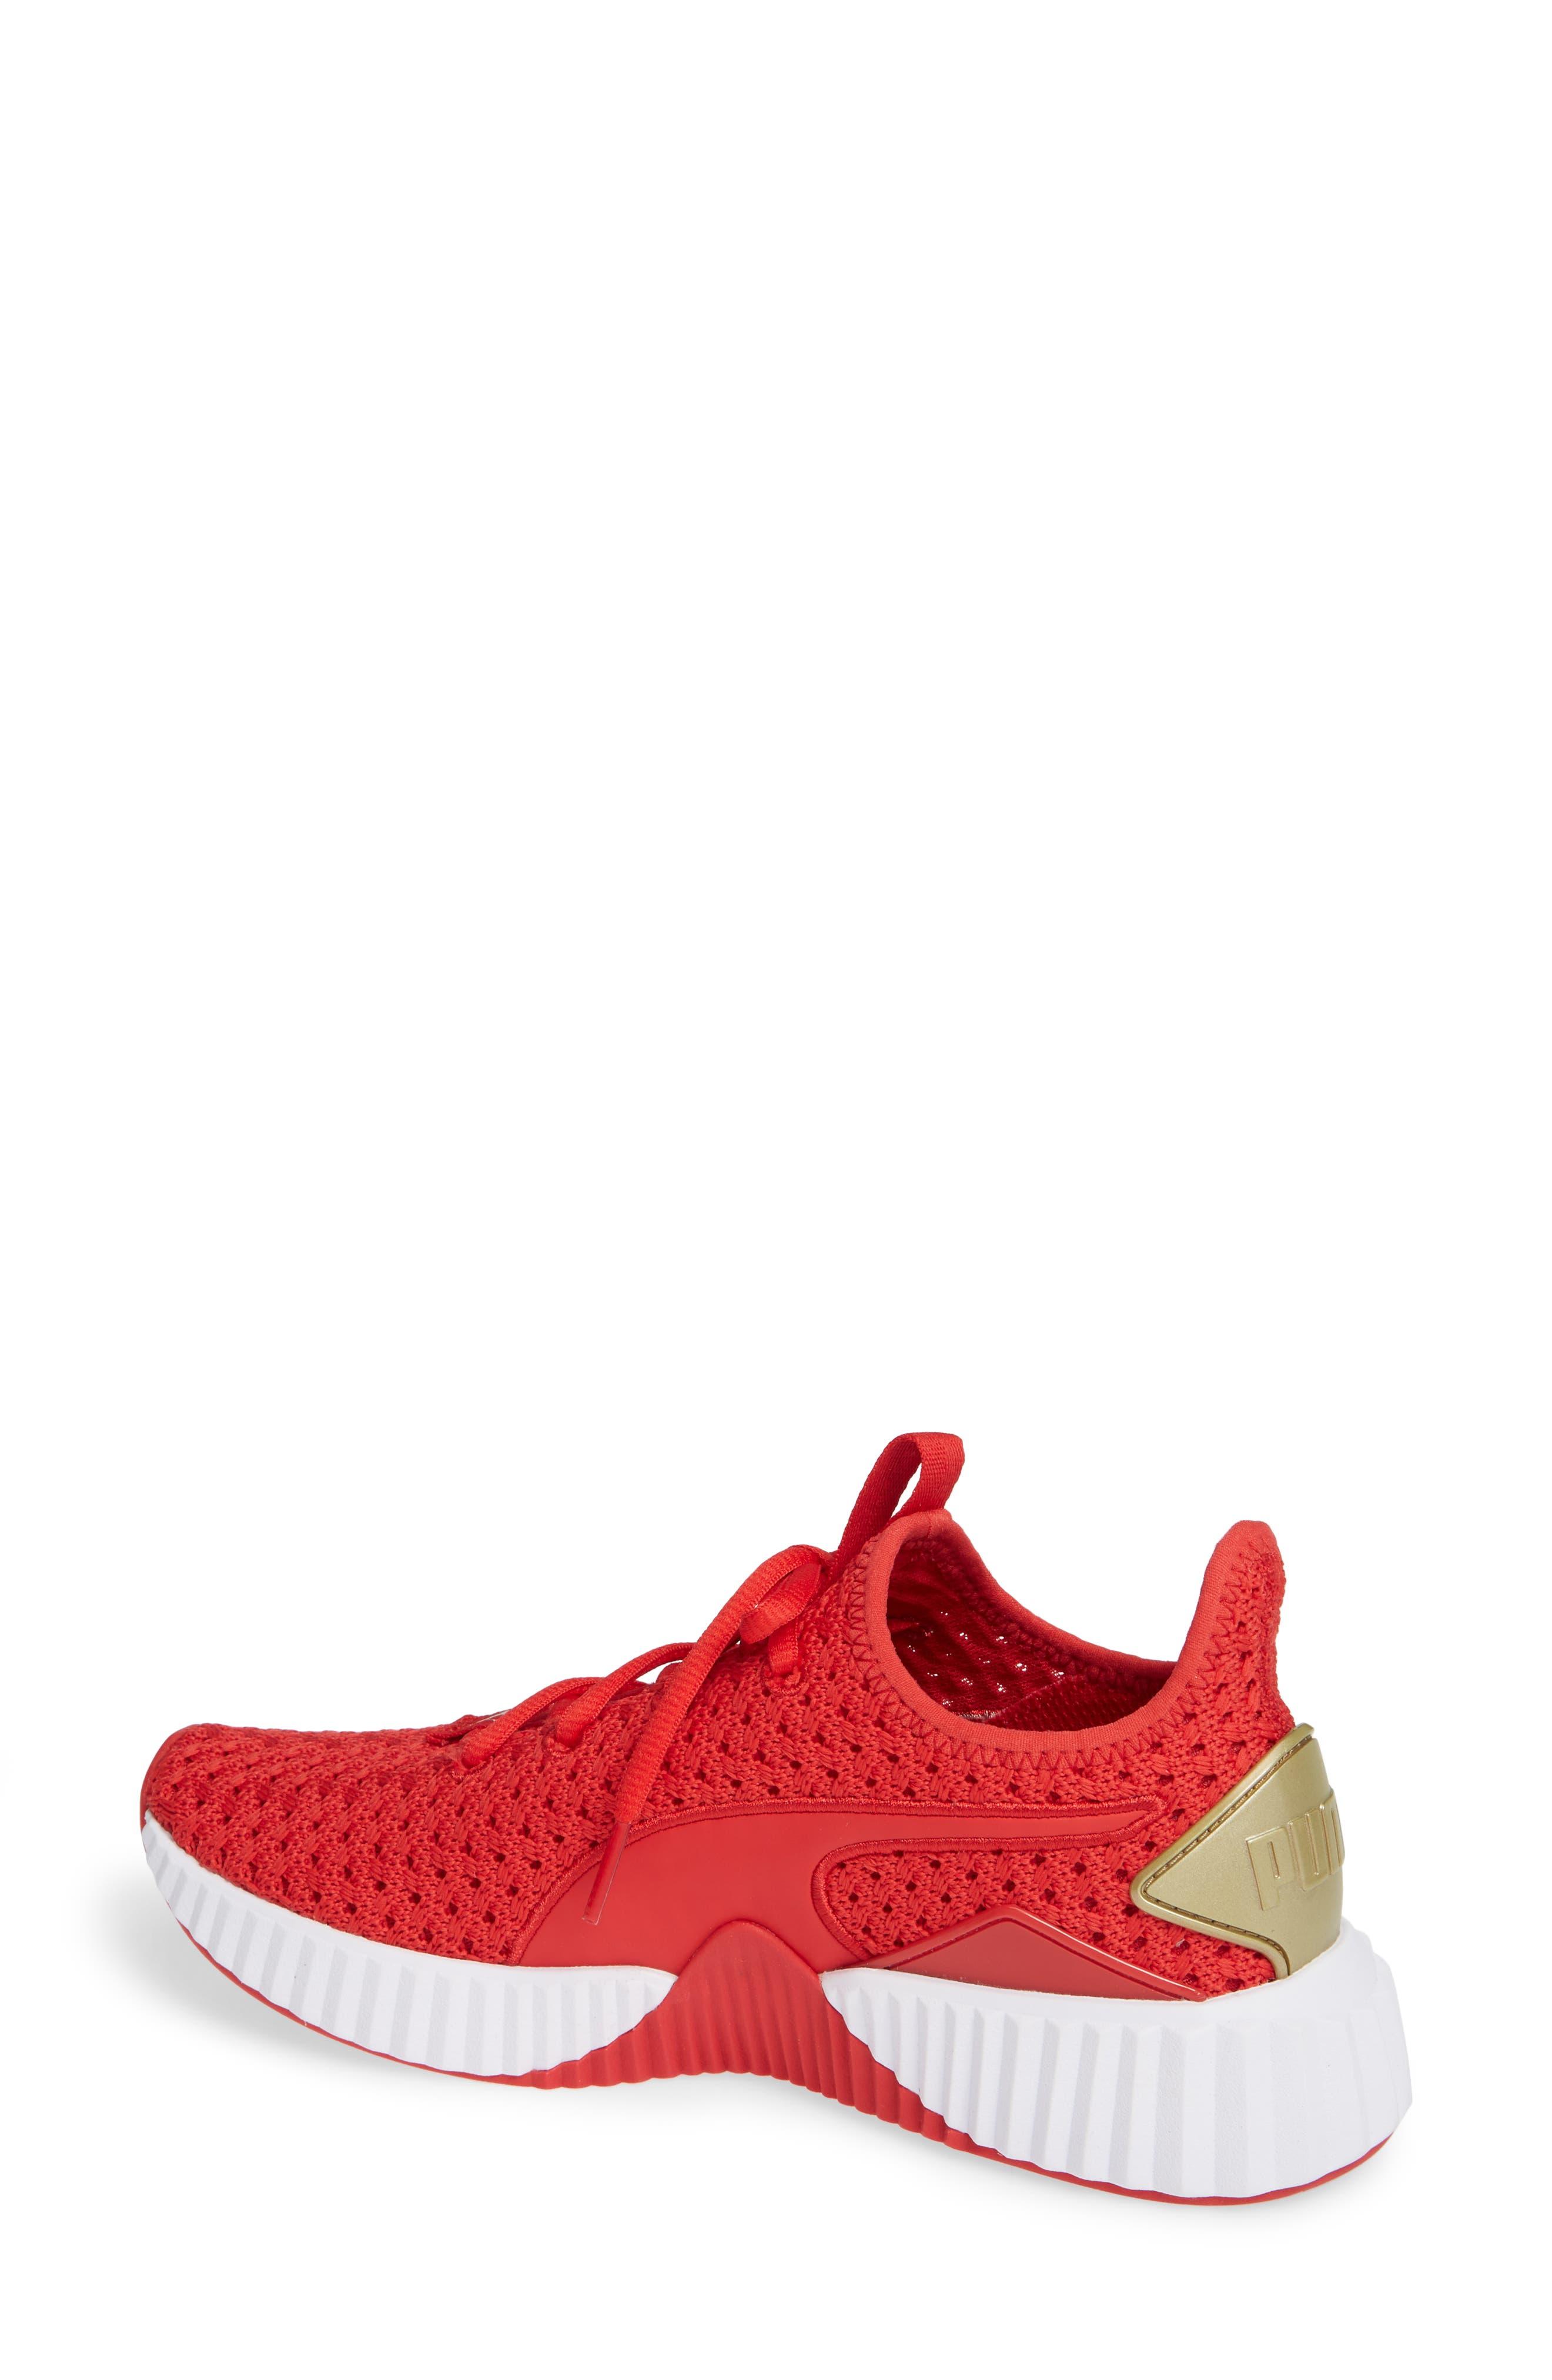 Defy Varsity Sneaker,                             Alternate thumbnail 2, color,                             RIBBON RED/ METALLIC GOLD